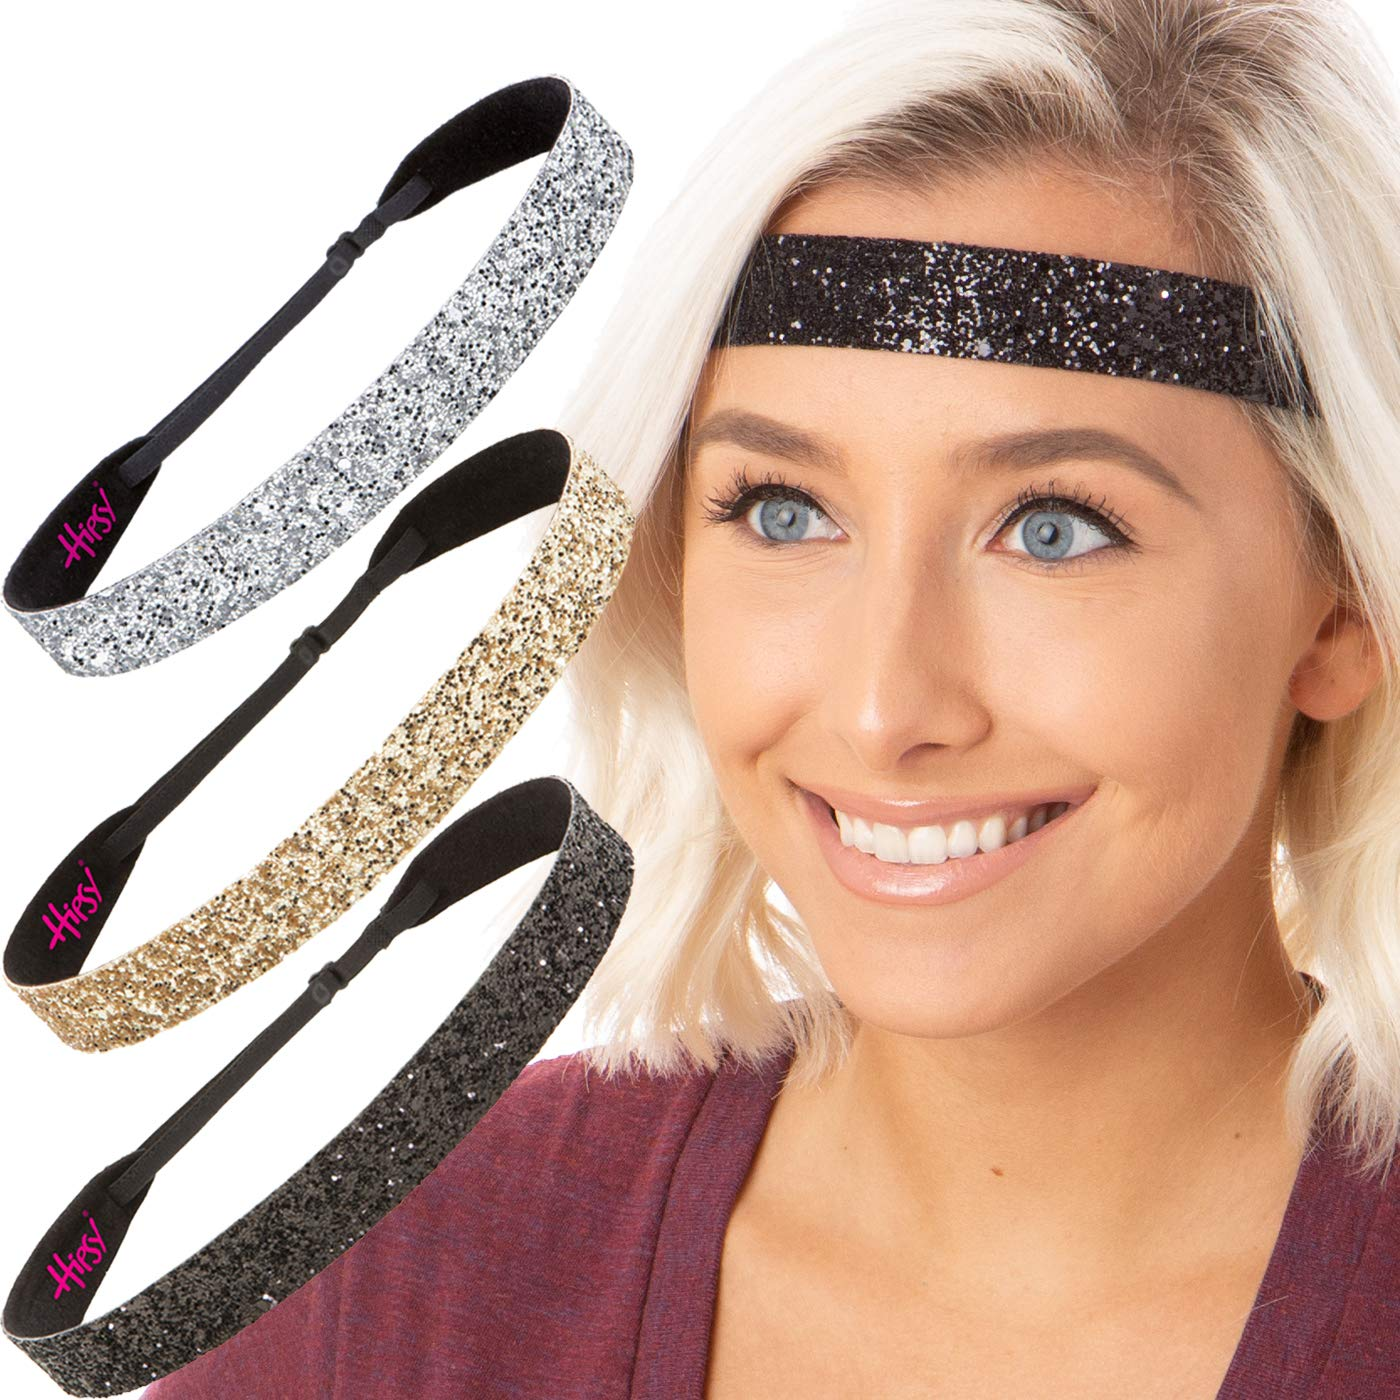 Hipsy Women's Adjustable NO SLIP Wide Bling Glitter Headband (3pk Wide Black/Gold/Silver Bling Glitter)